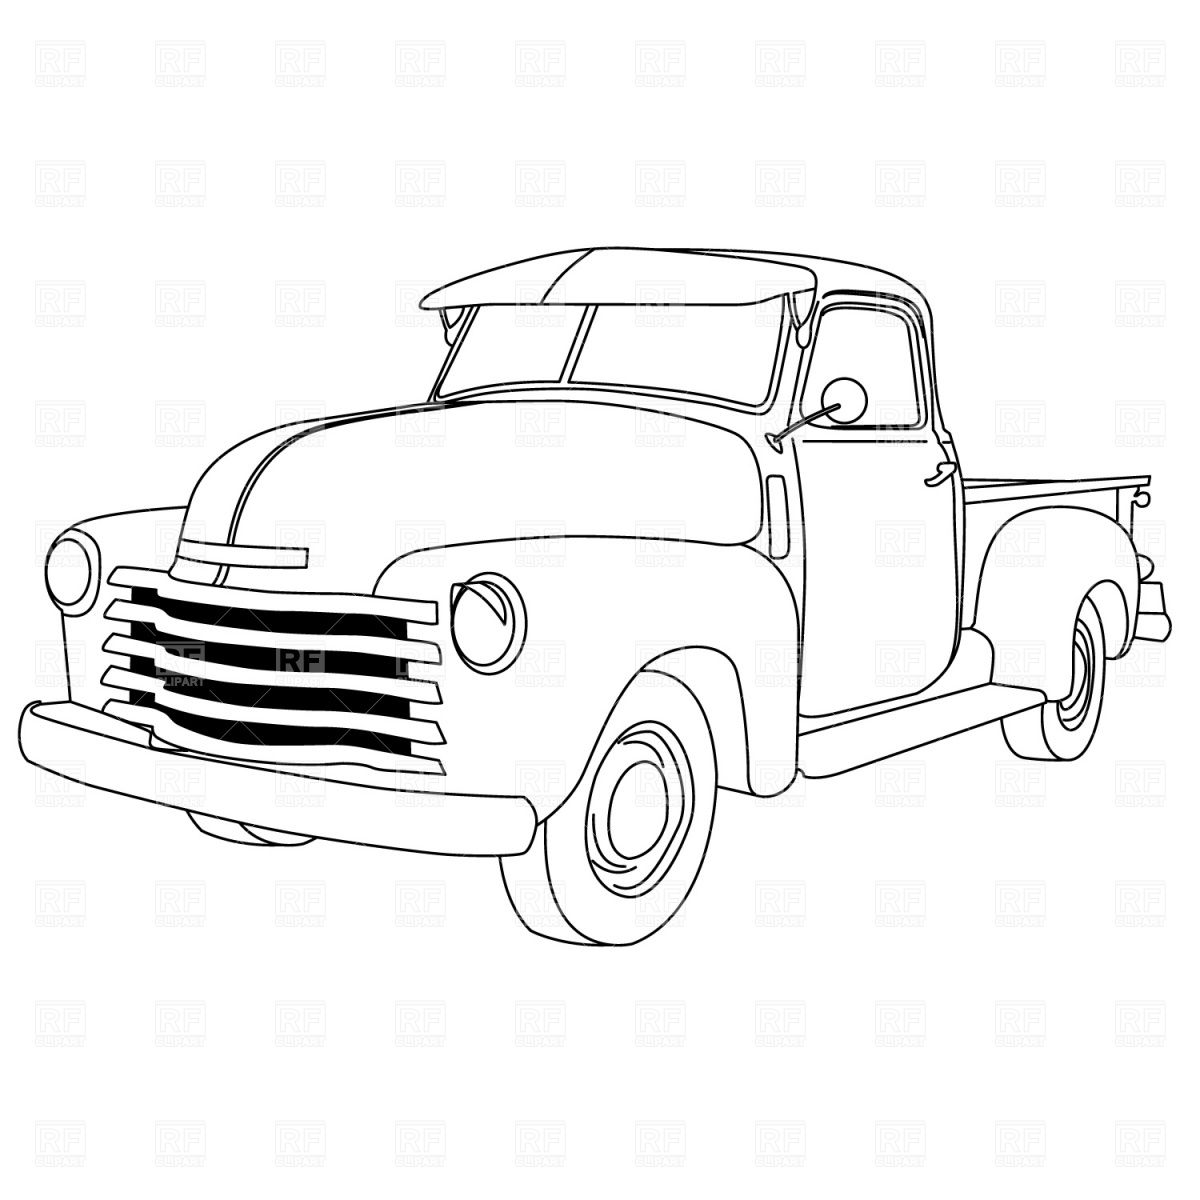 1200x1200 60s Truck Coloring Pages Truck Coloring Pages For Boys